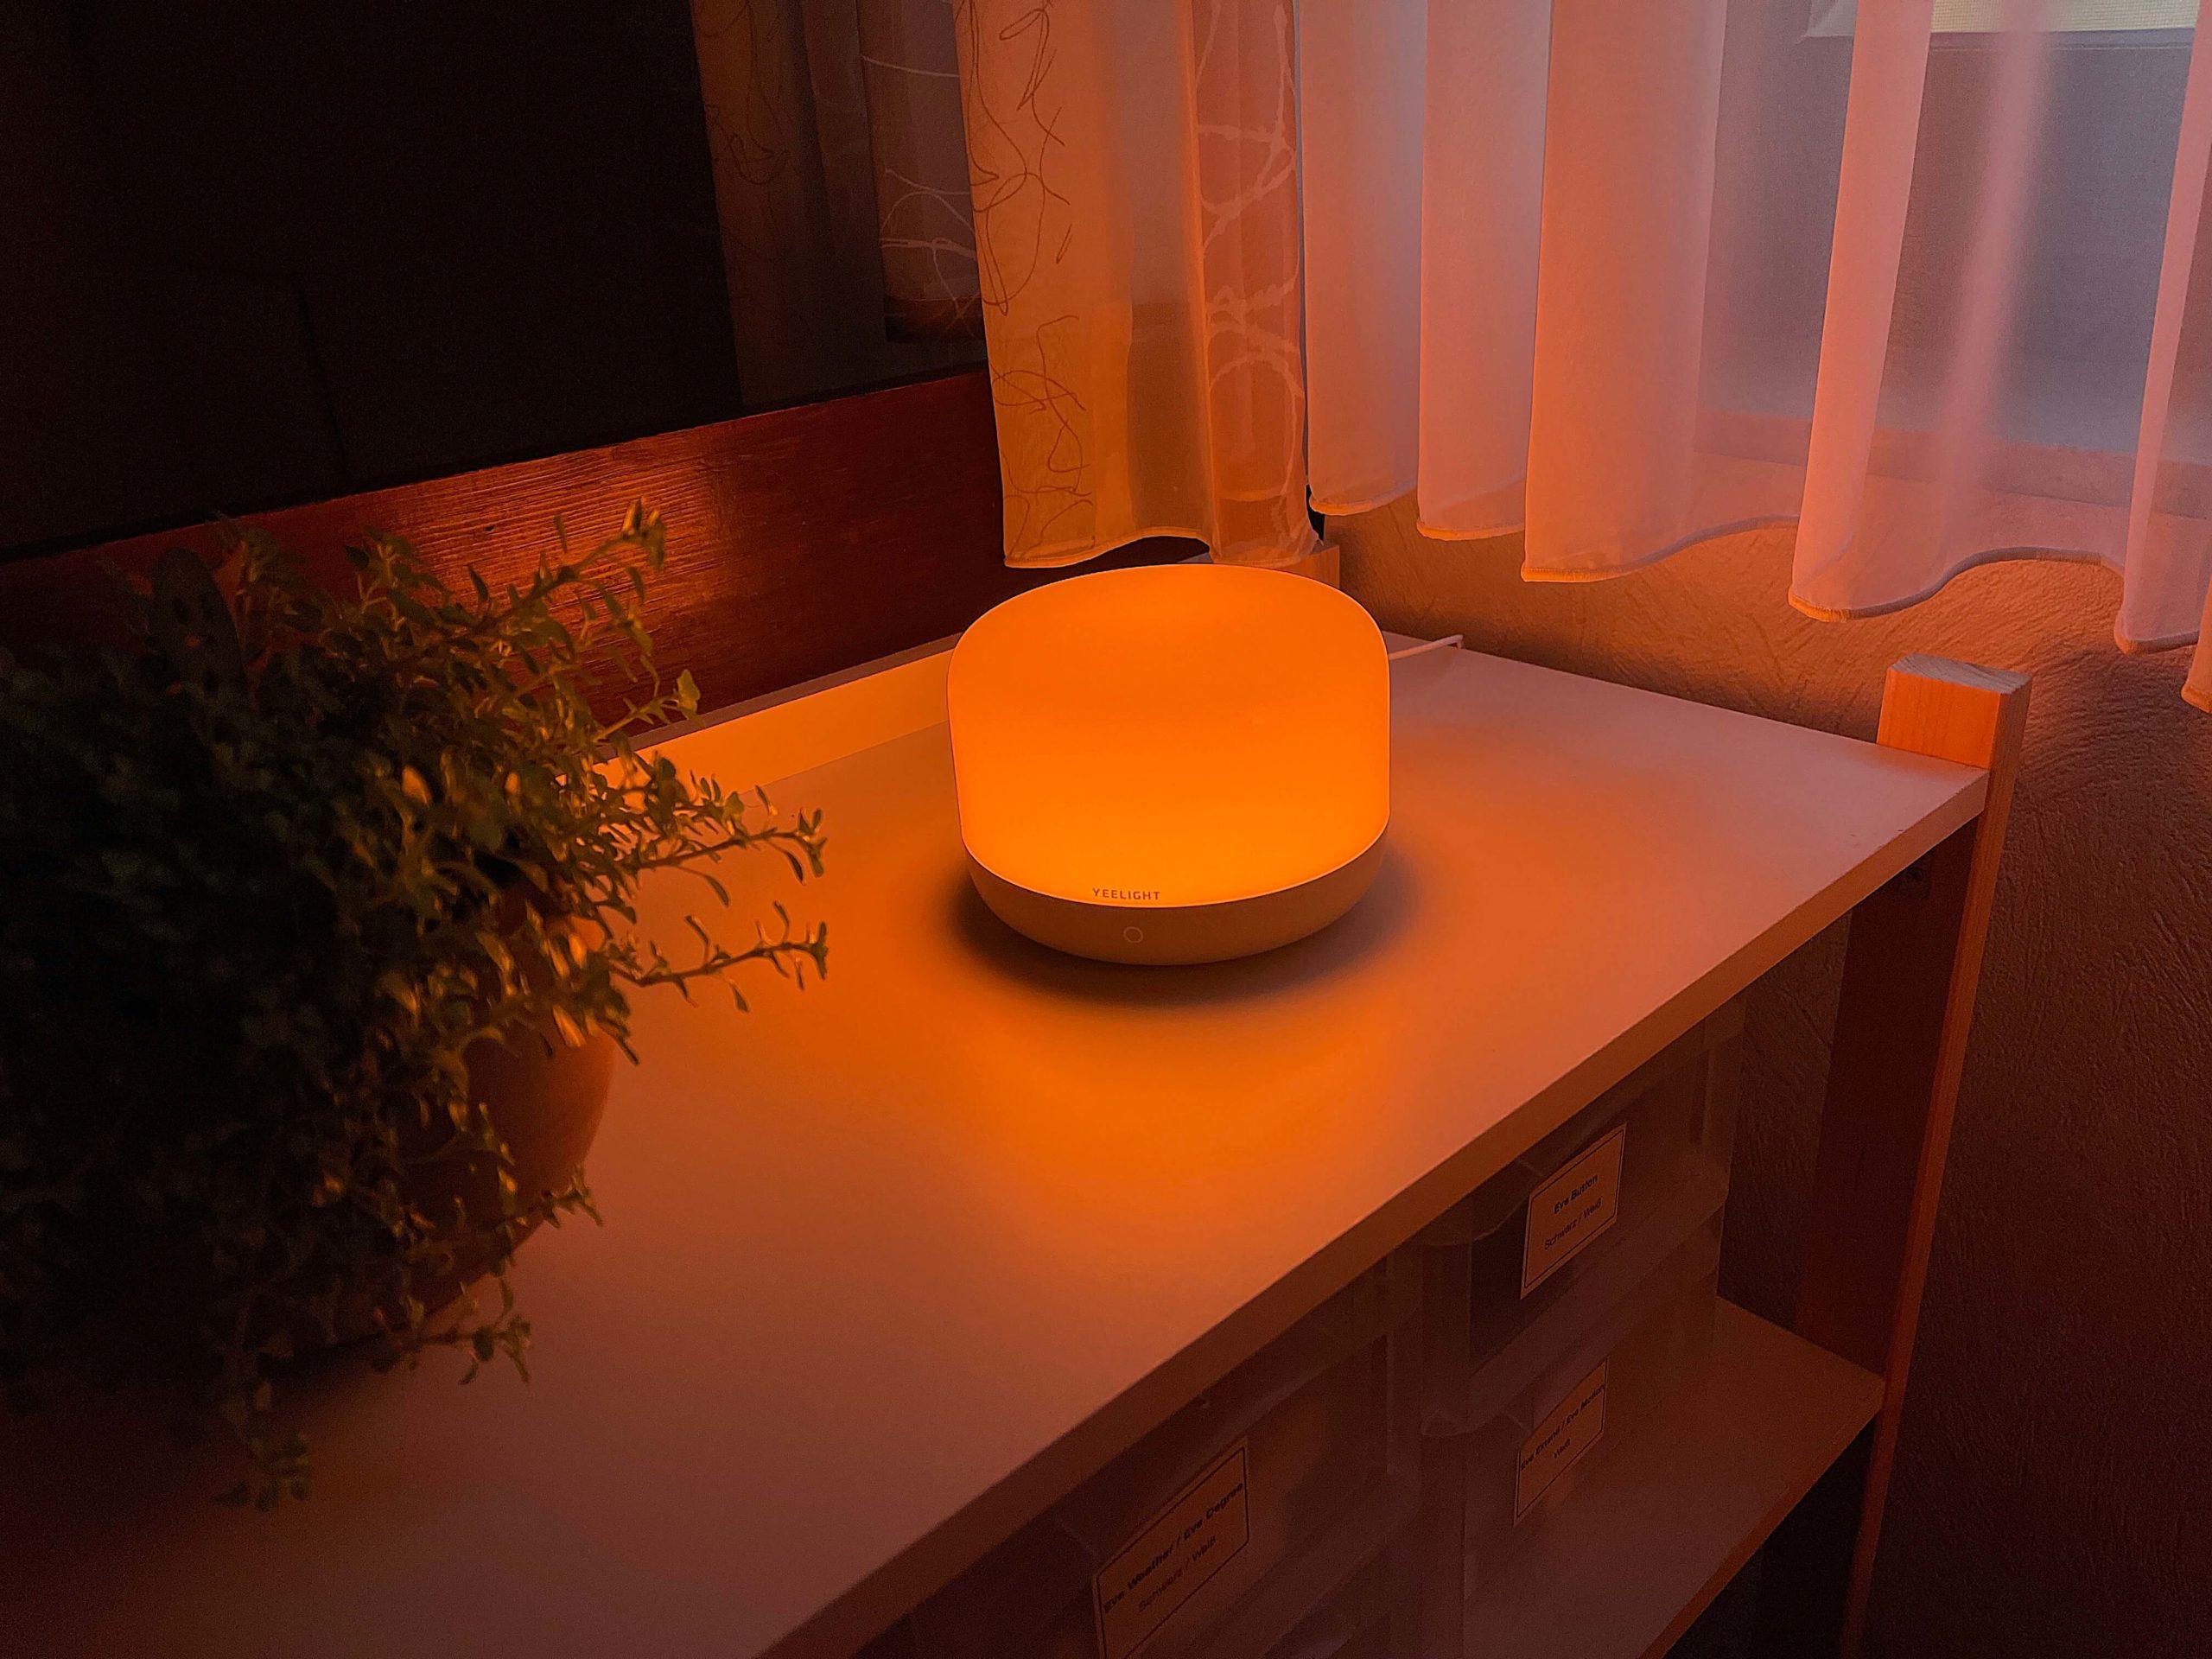 Apple-HomeKit-Nachttischlampe-D2-von-Yeelight1-scaled Nachttischlampe D2 von Yeelight mit Apple HomeKit